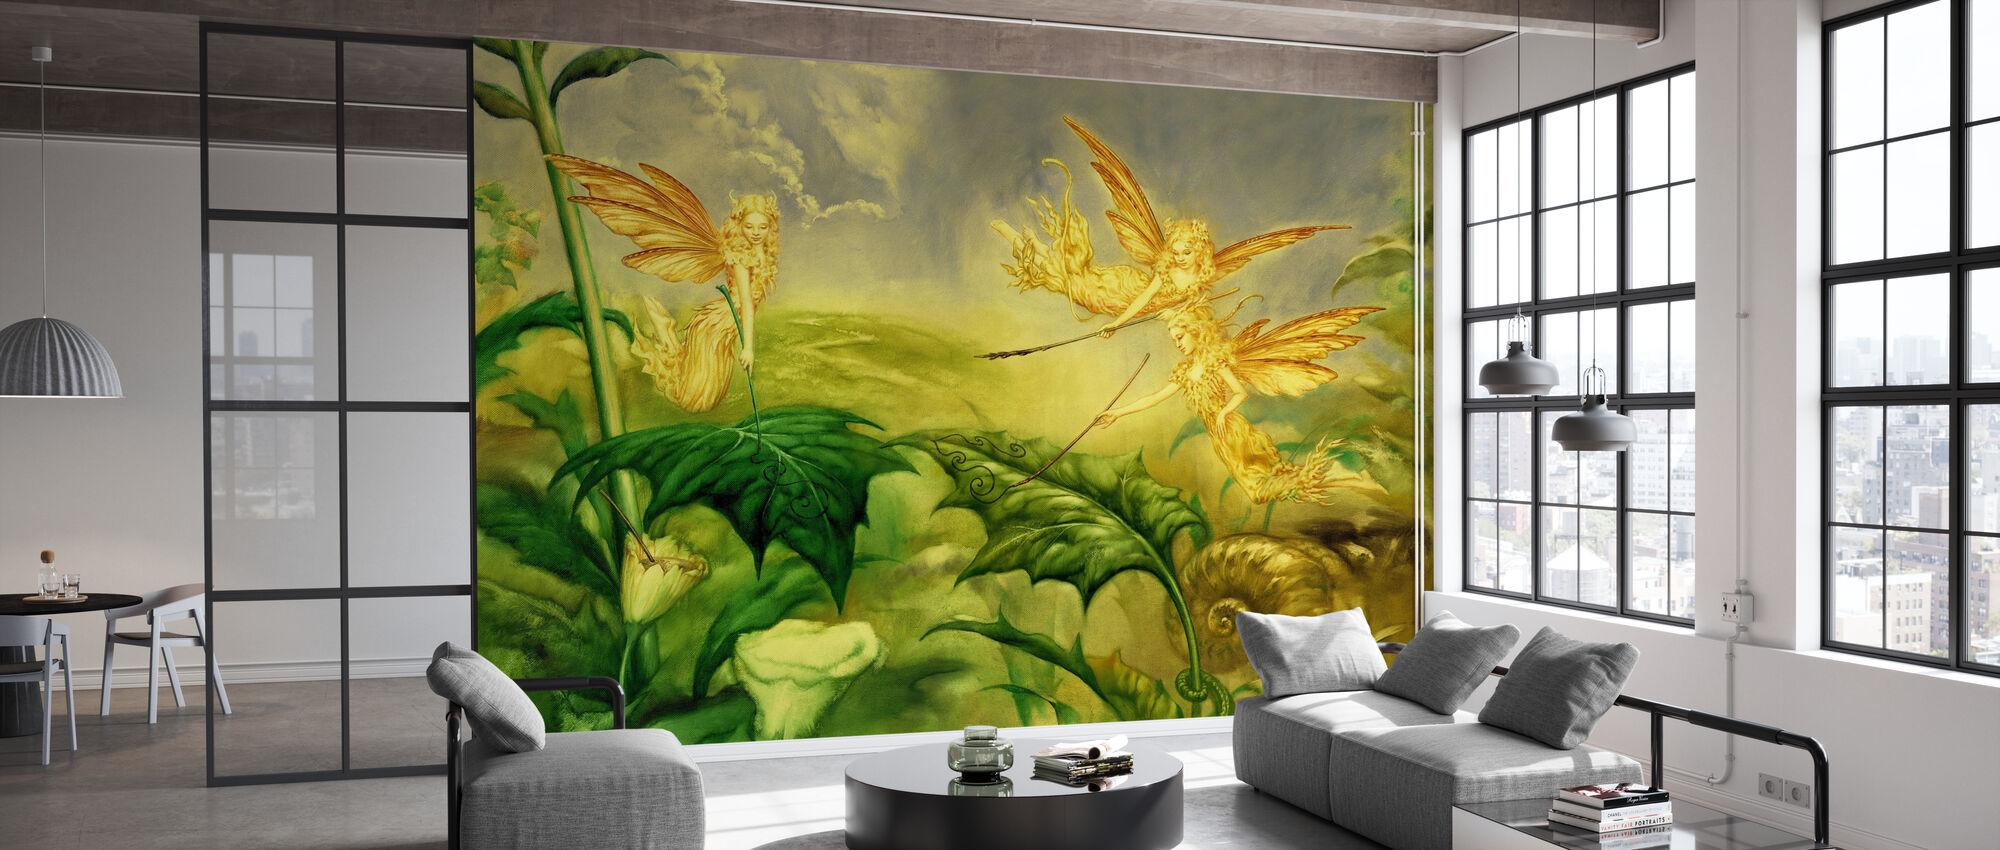 Fairies - Wallpaper - Office